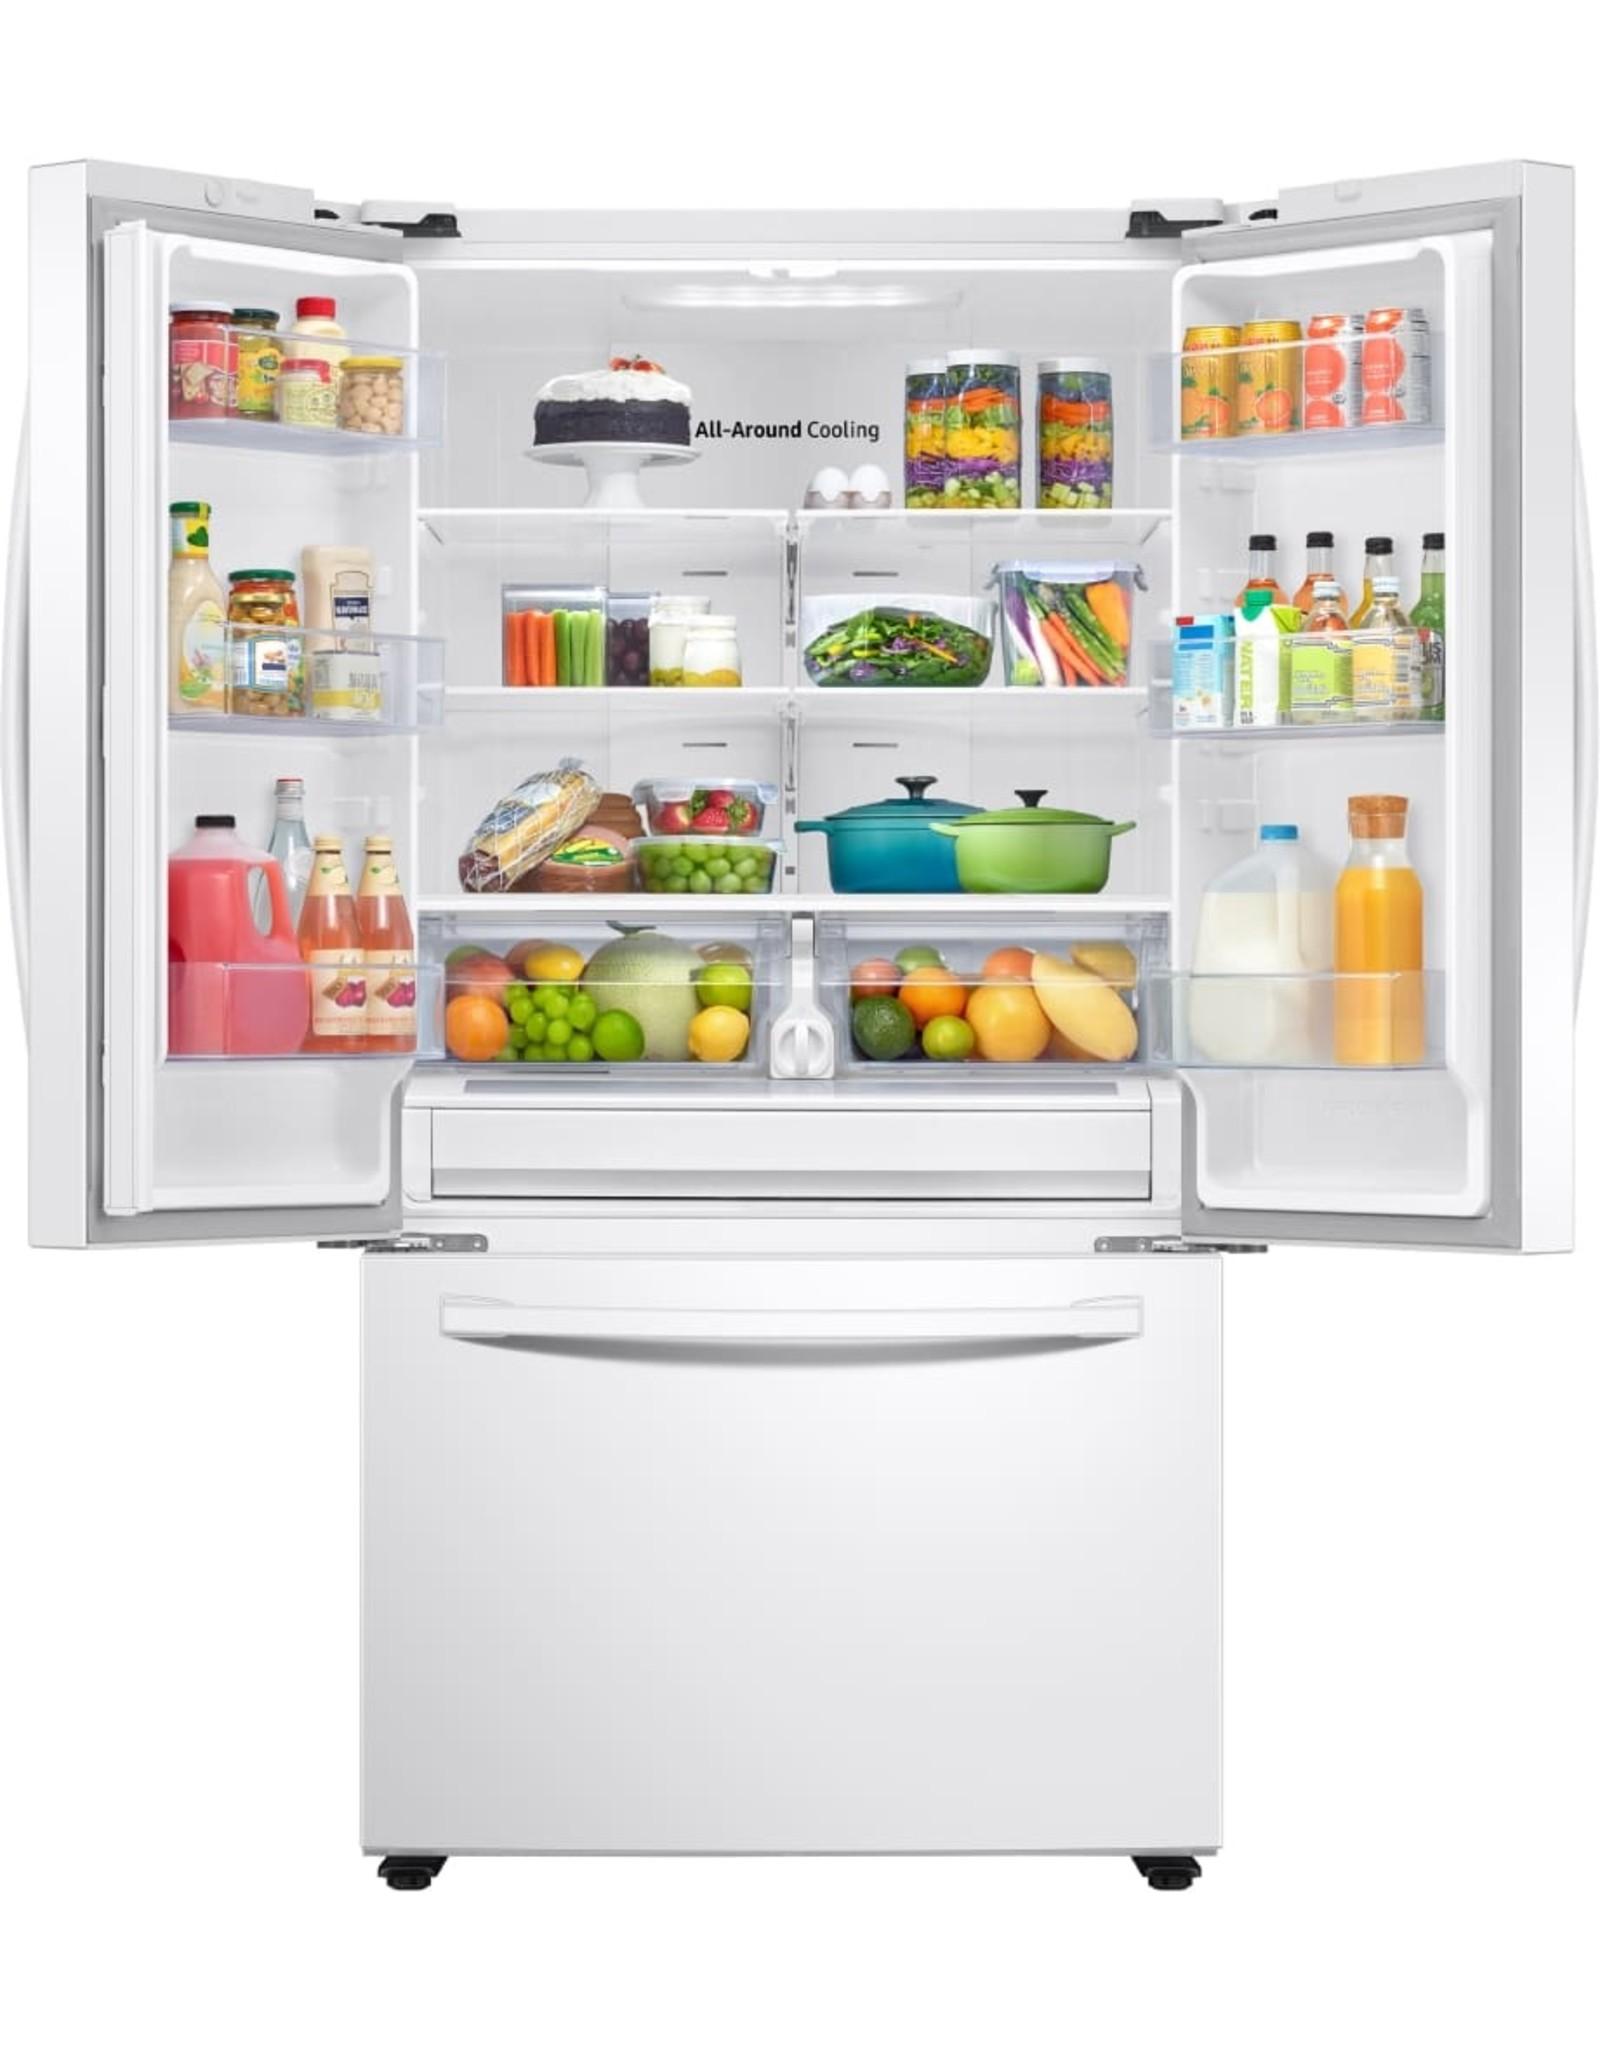 SAMSUNG 28.2 cu. ft. French Door Refrigerator in White